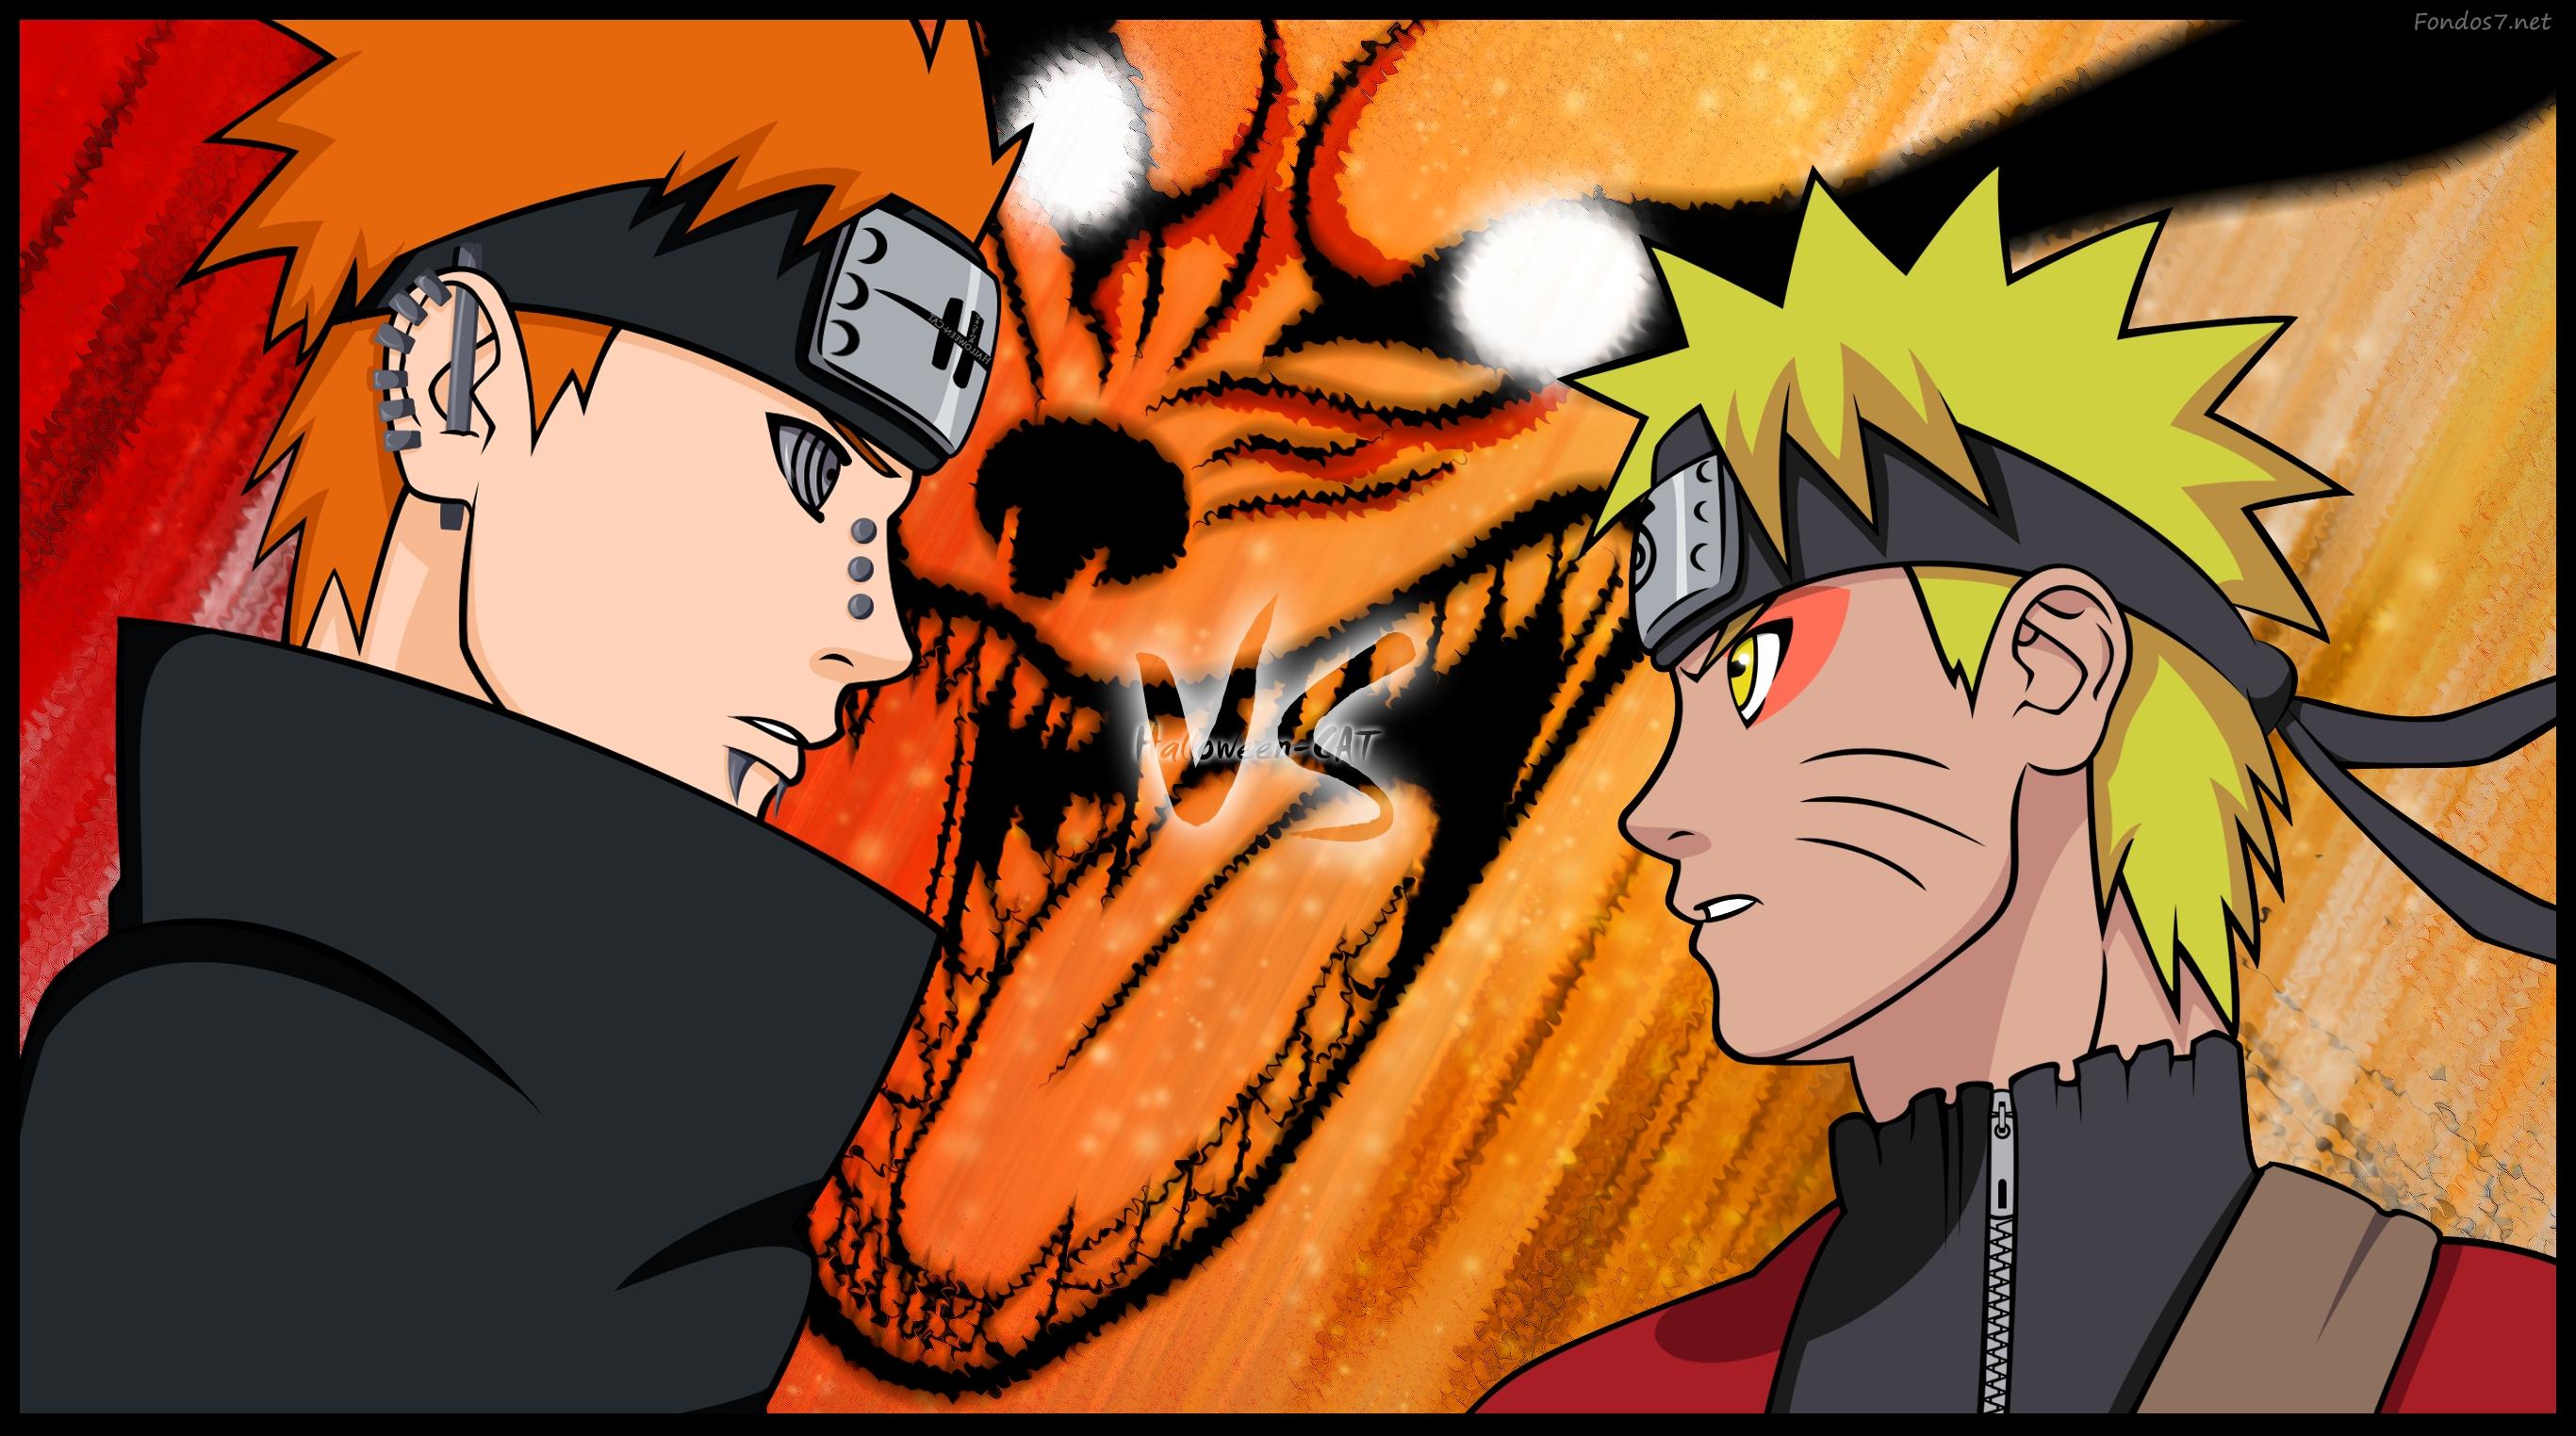 46+] Naruto vs Pain Wallpaper on WallpaperSafari